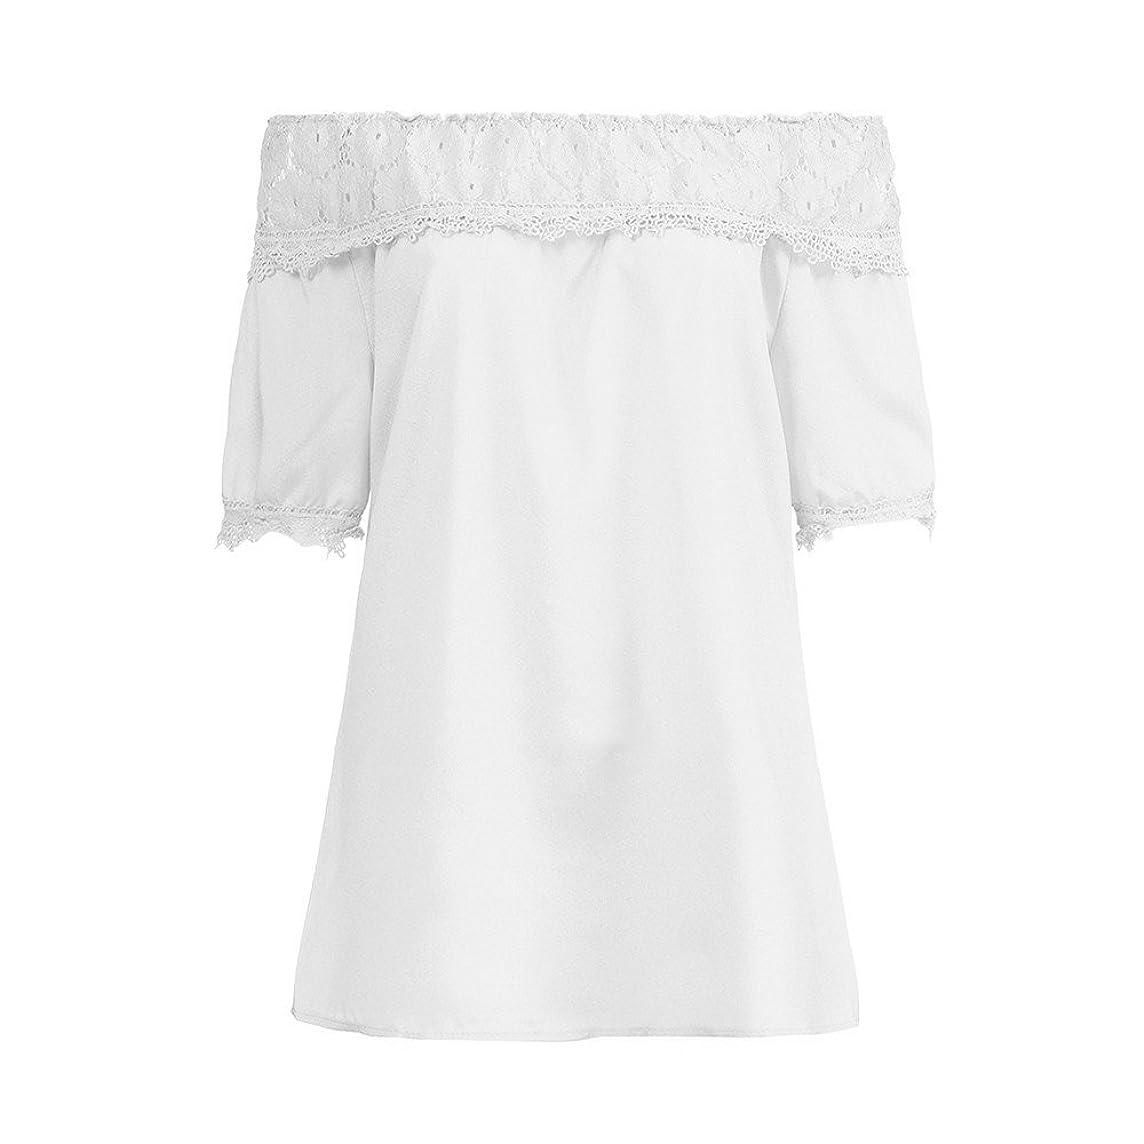 AOJIAN Women's T Shirt Short Sleeve Shirts Off Shoulder Applique Tunic Blouse Tanks Vest Tops for Women